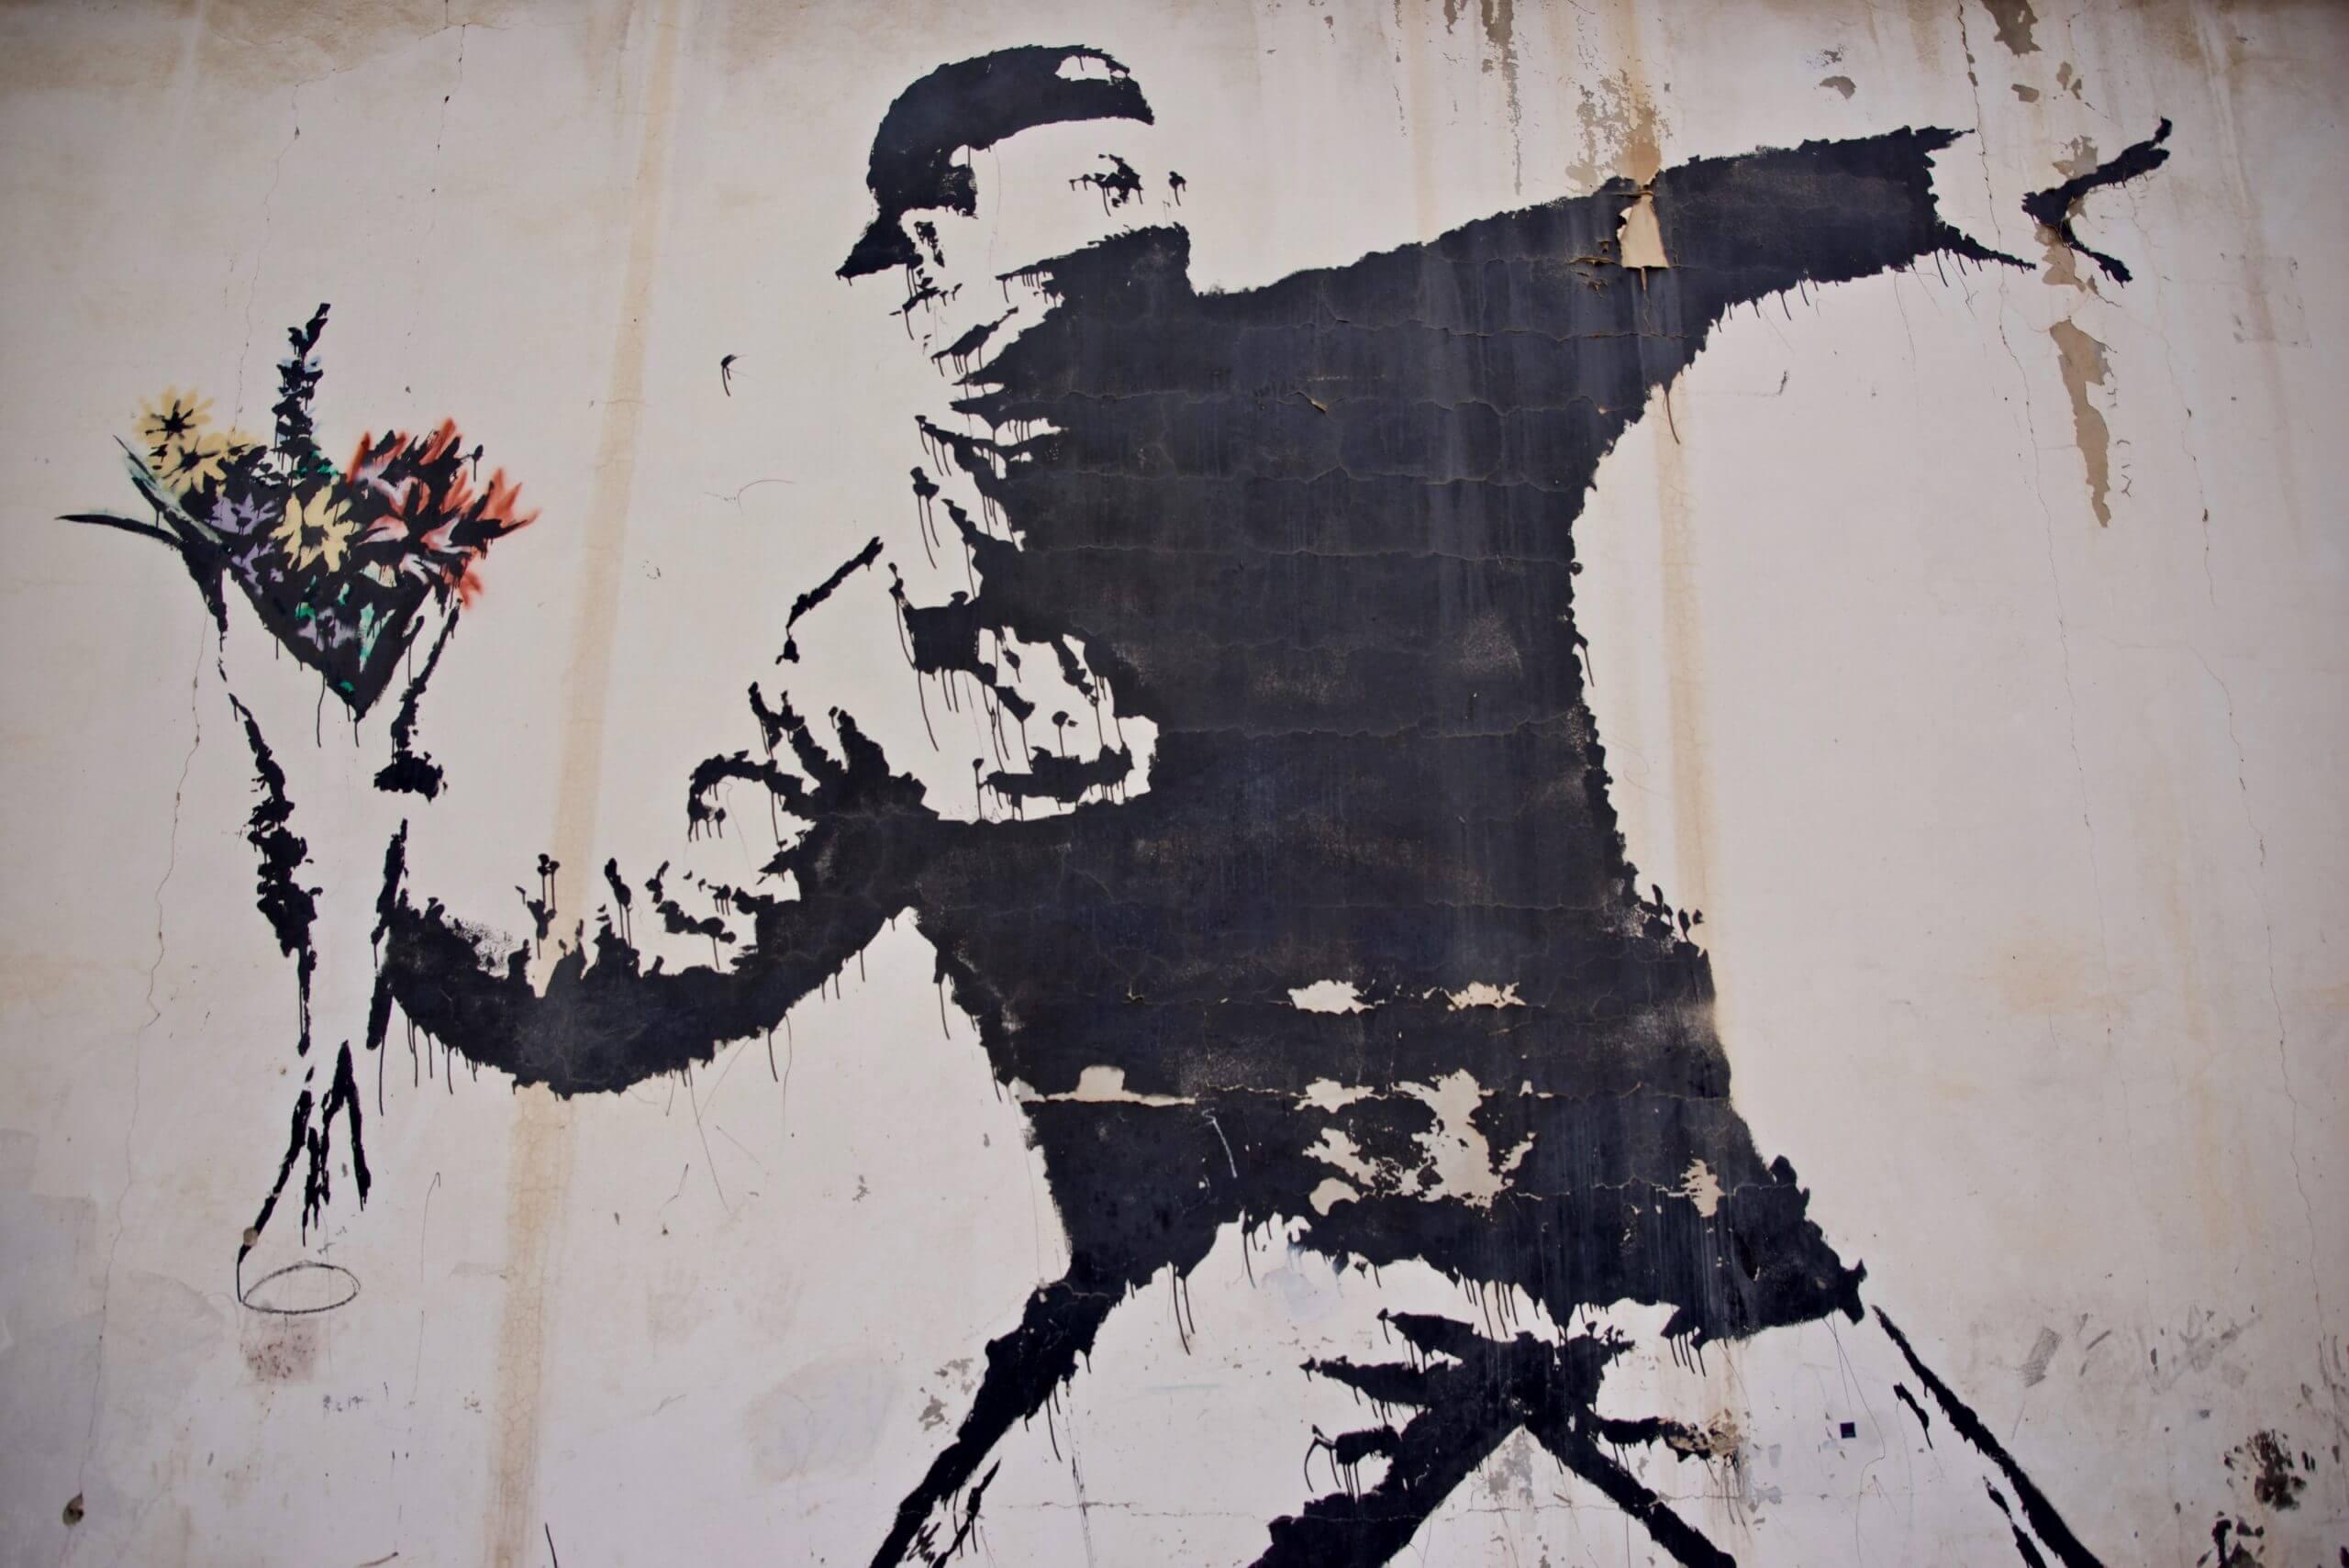 картина арт Banksy художник